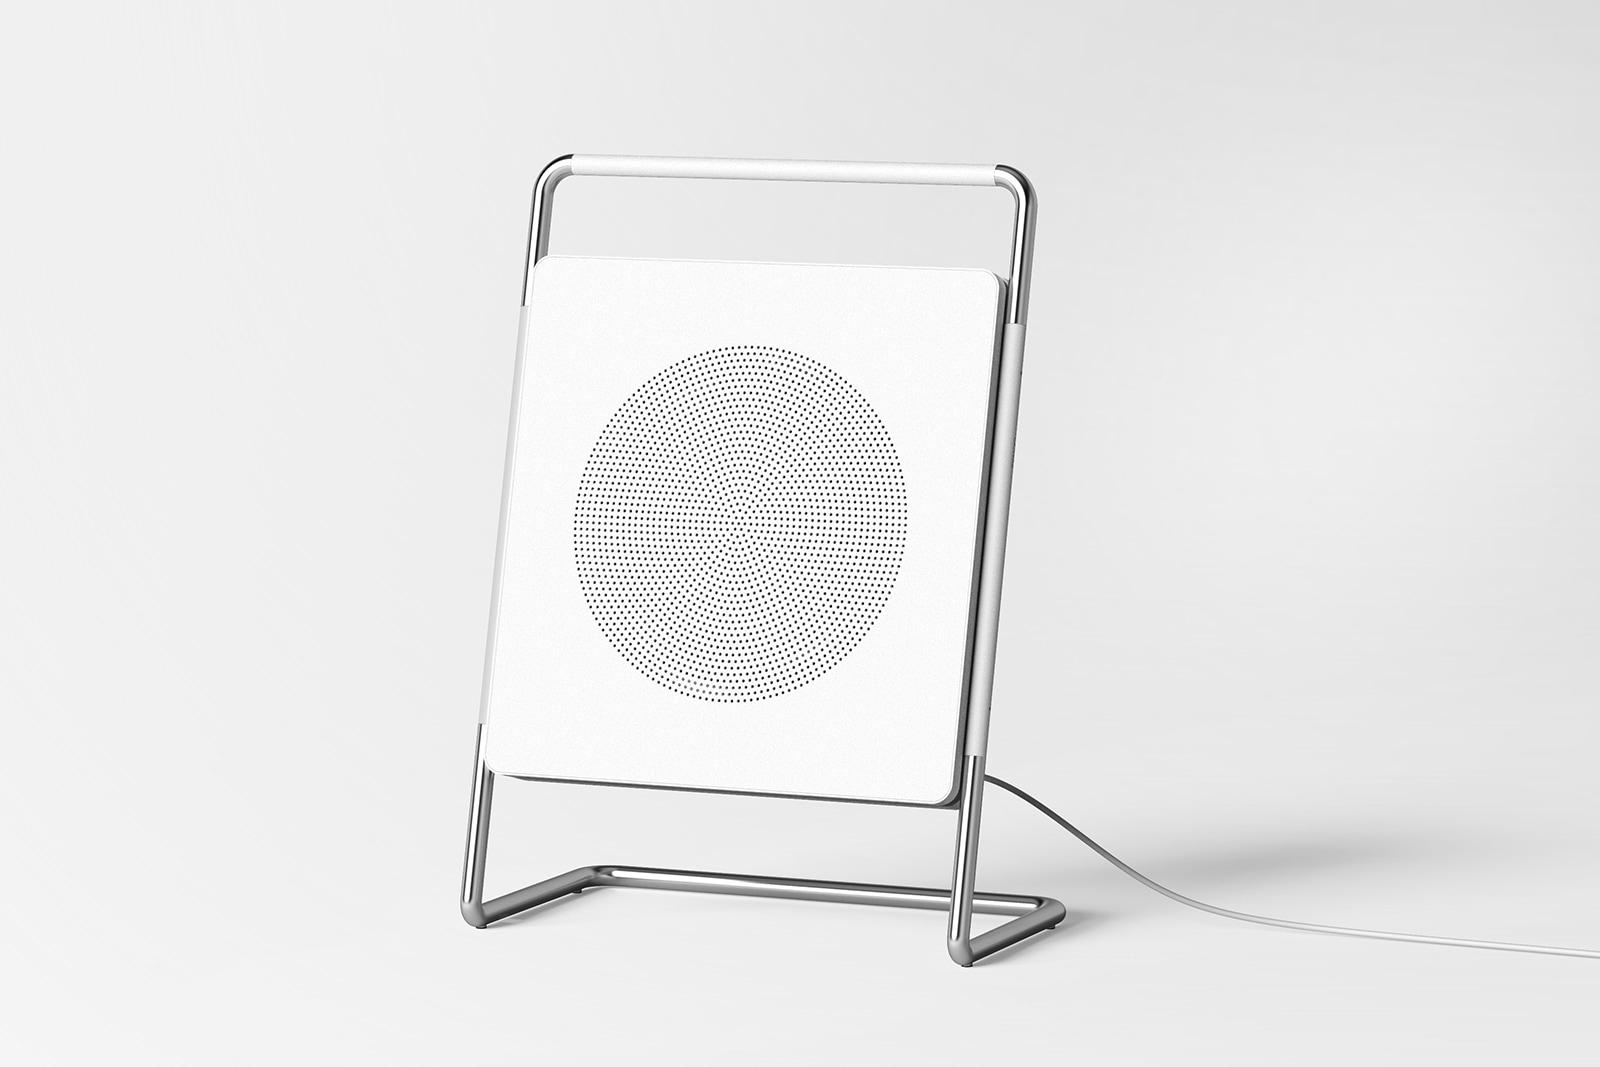 Blending lines electronics furn - minimalissimo | ello